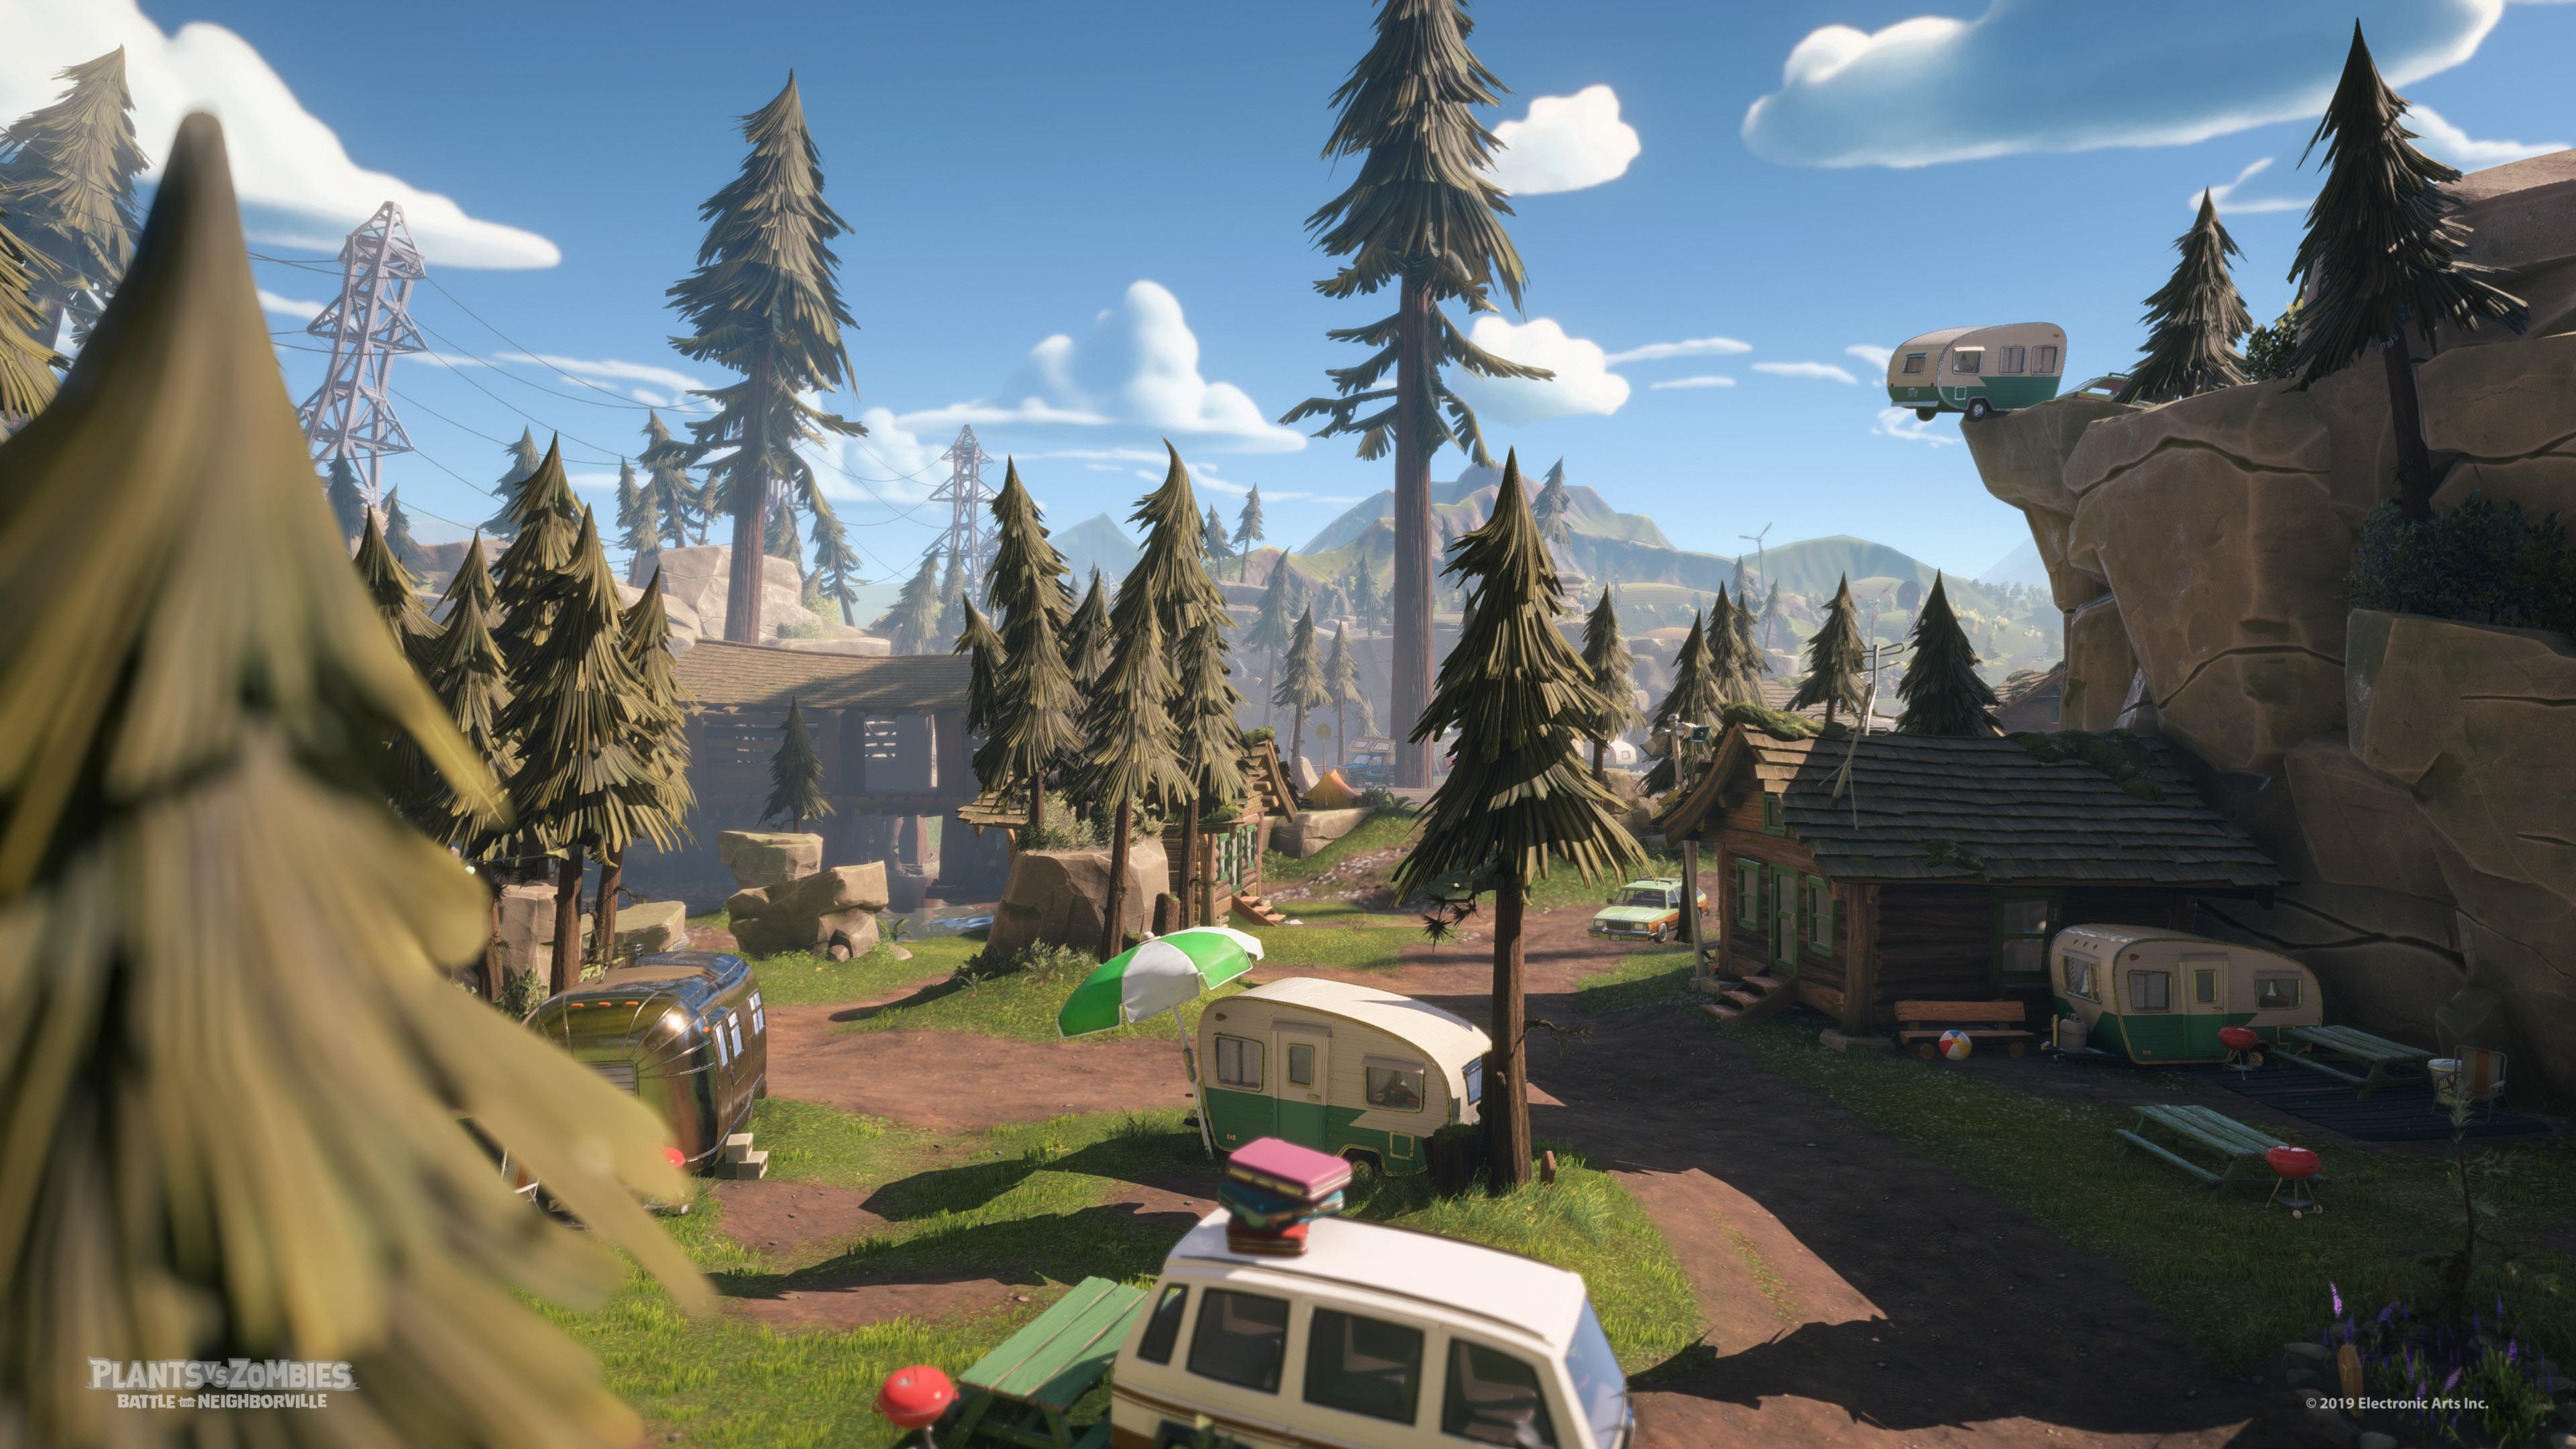 Plantsvs.Zombies-BattleforNeighborville Multi Editeur 007